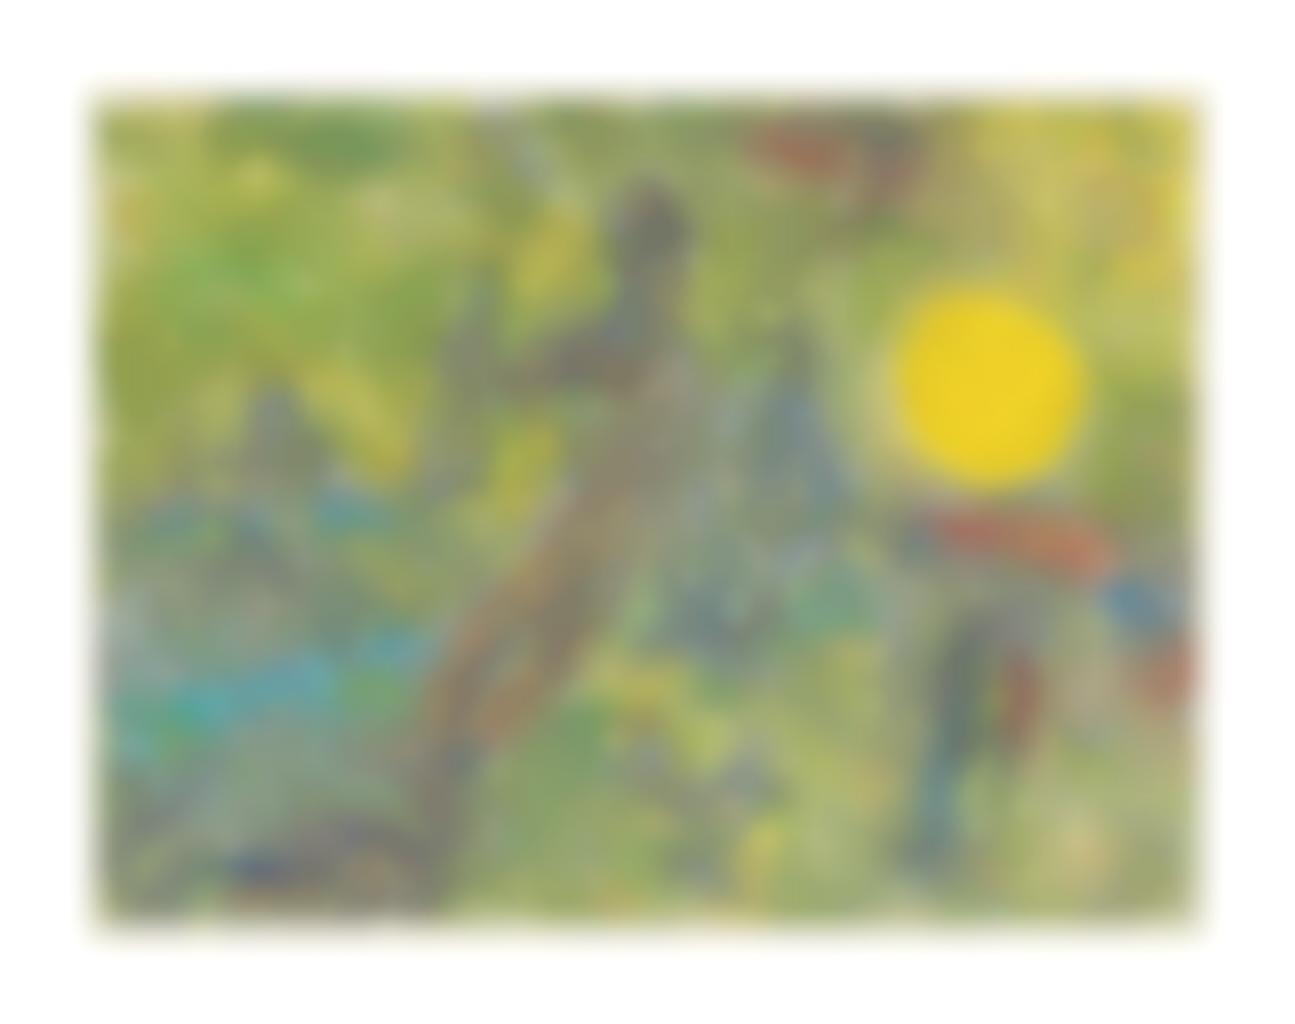 Marc Chagall-Les Maries au soleil jaune-1965